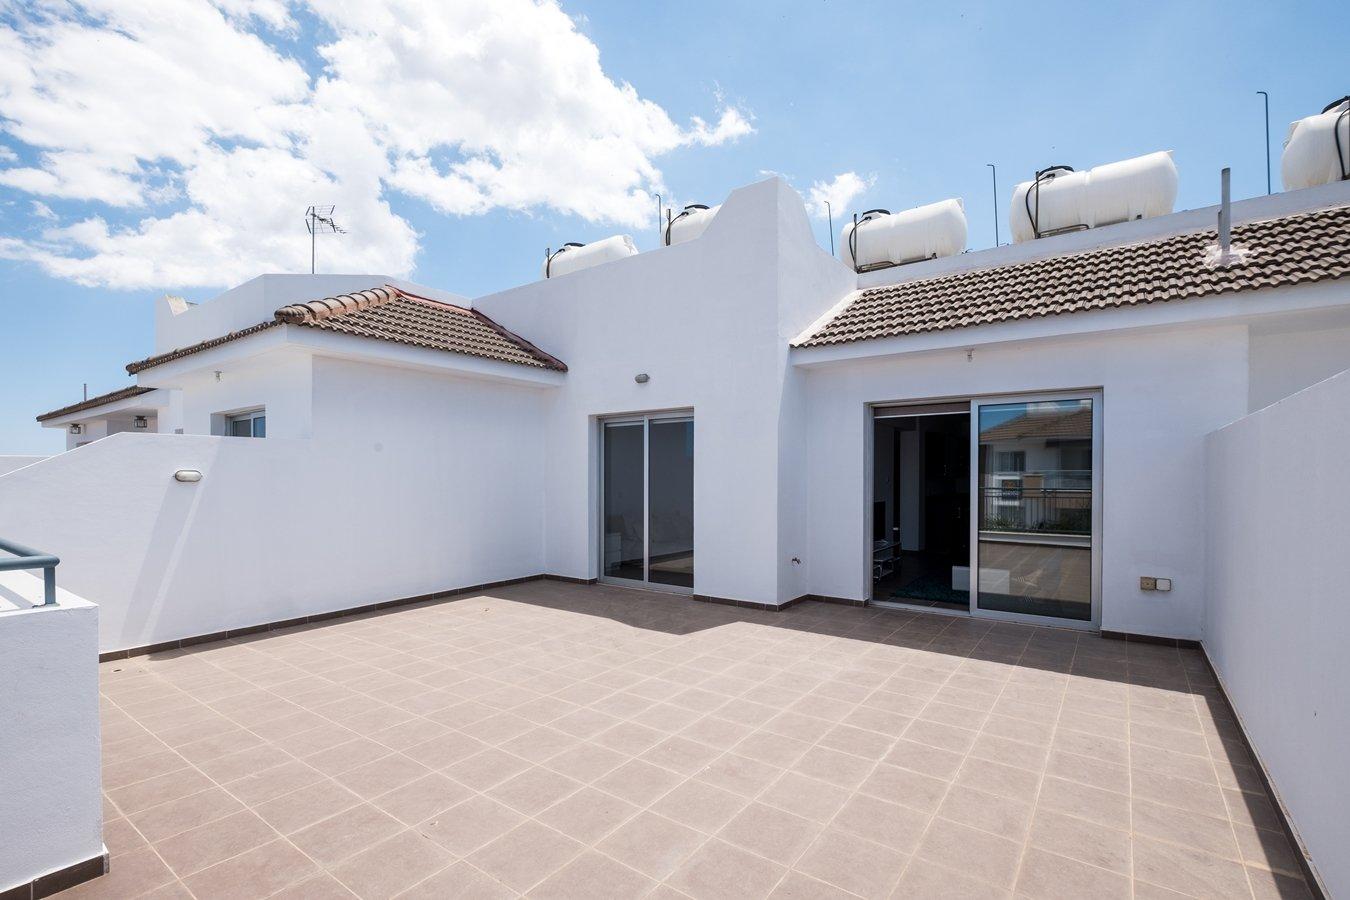 Chara-Kypria-Apartments-204-DSCF0544